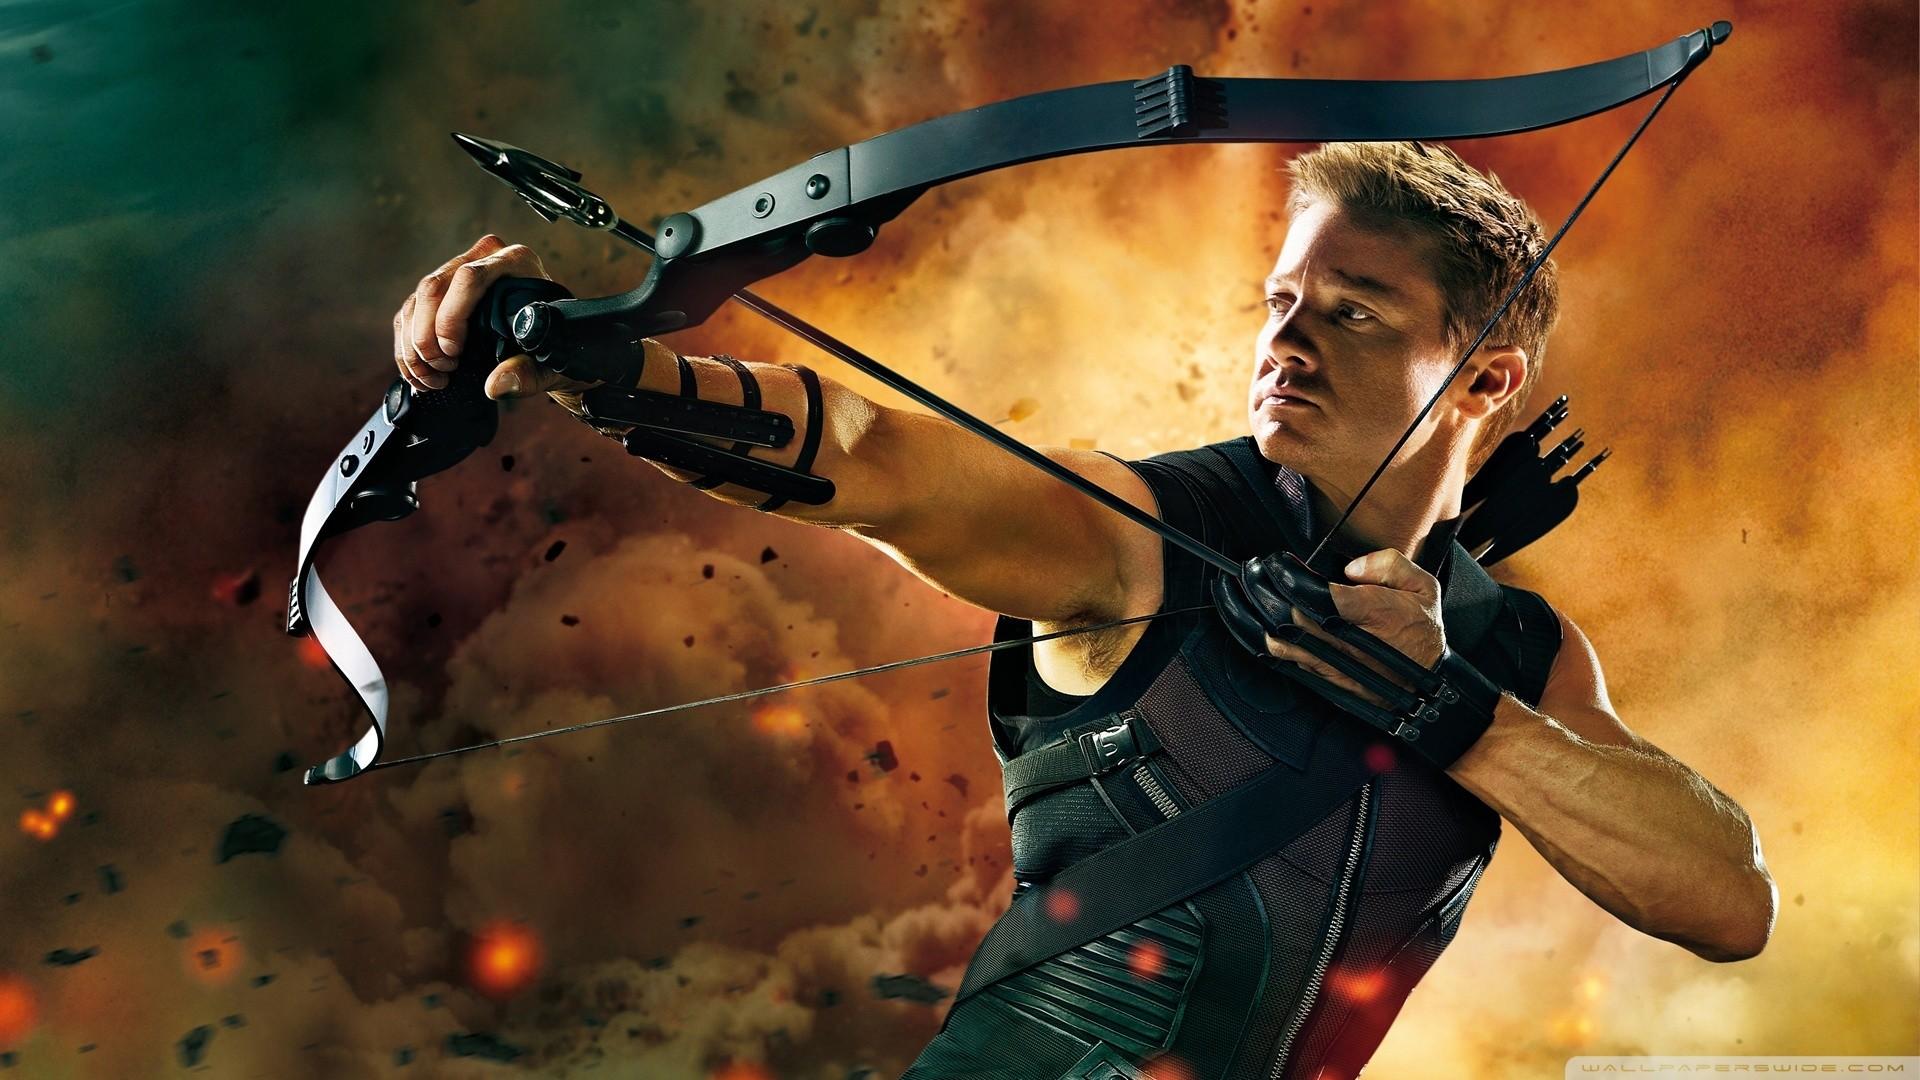 Marvel-The-Avengers-Movie-2012-HD-Wallpaper-Hawkeye-